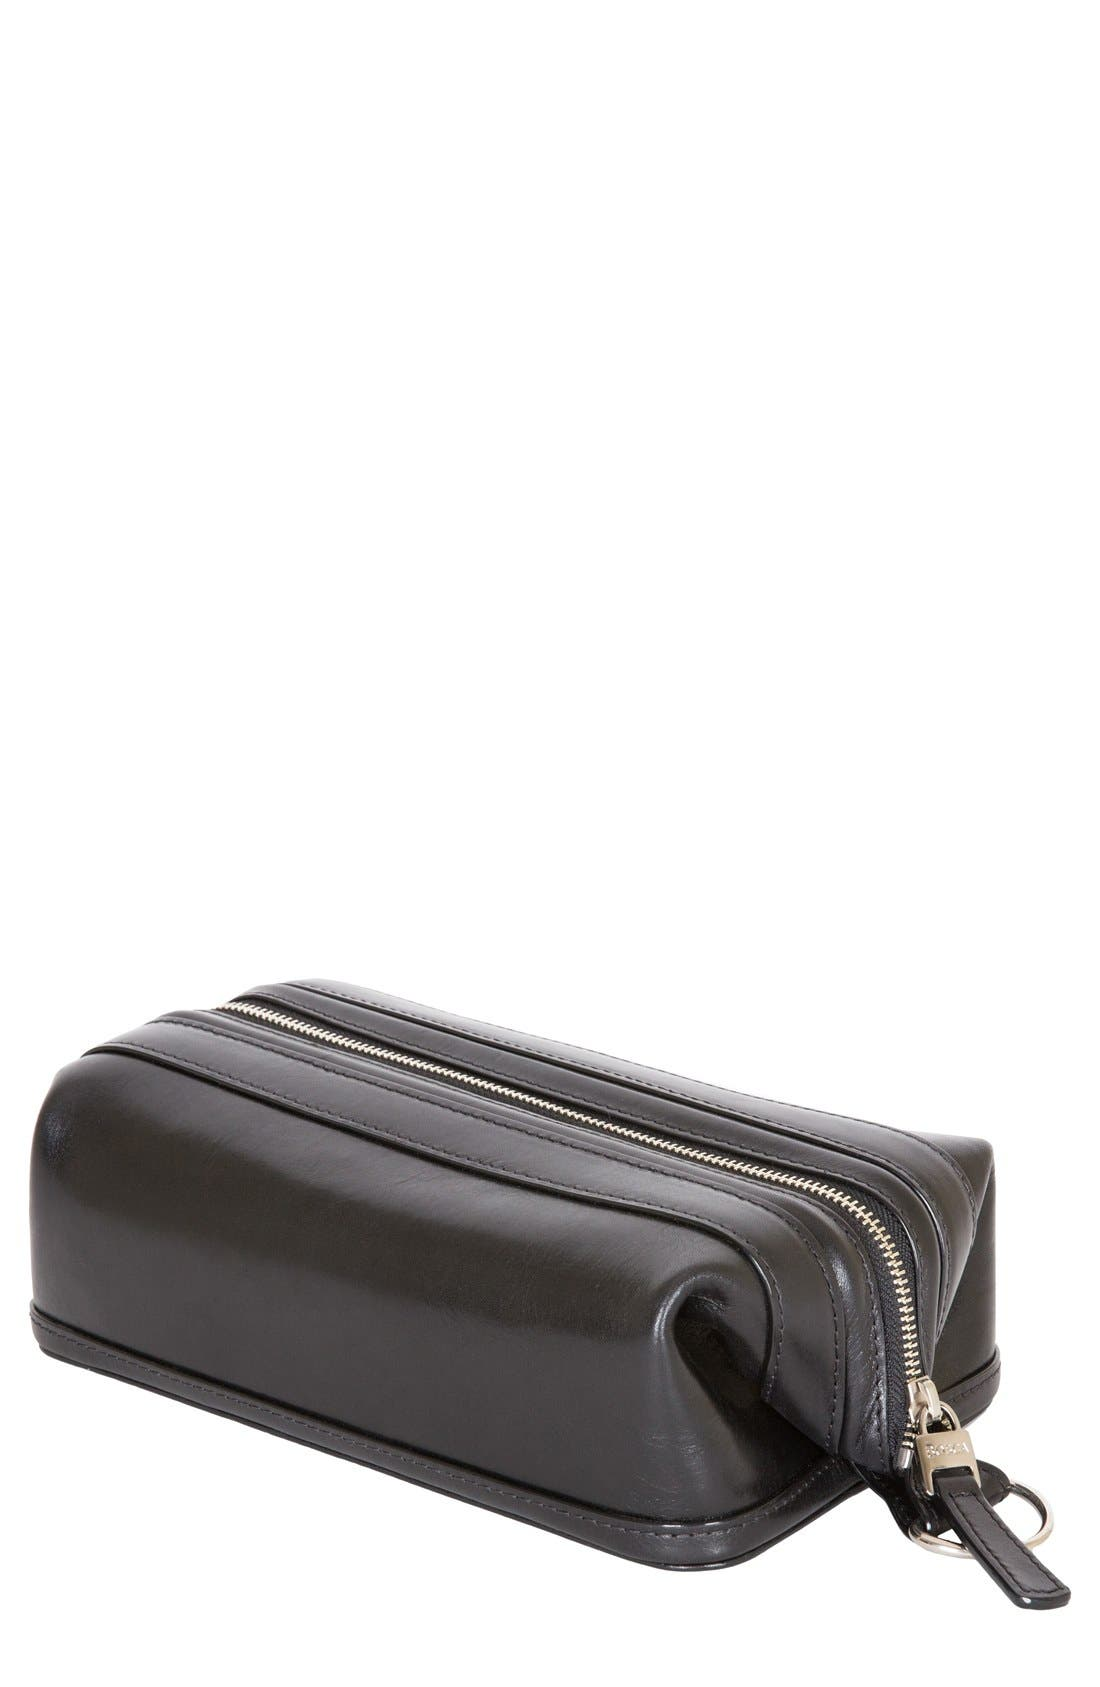 Bosca Leather Toiletry Kit